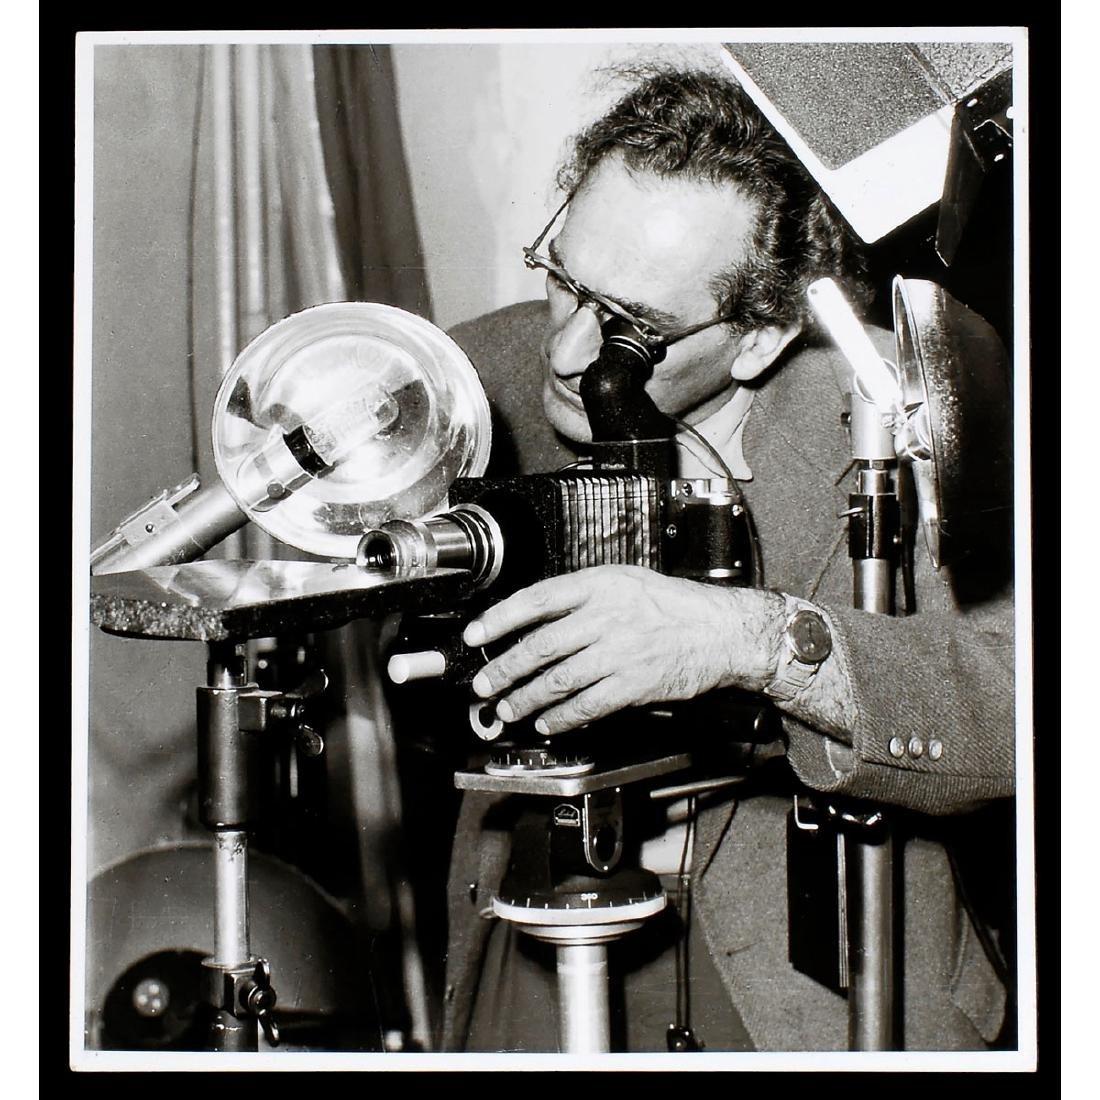 Leica IIIf Outfit of the Photo Journalist Peter Fischer - 3